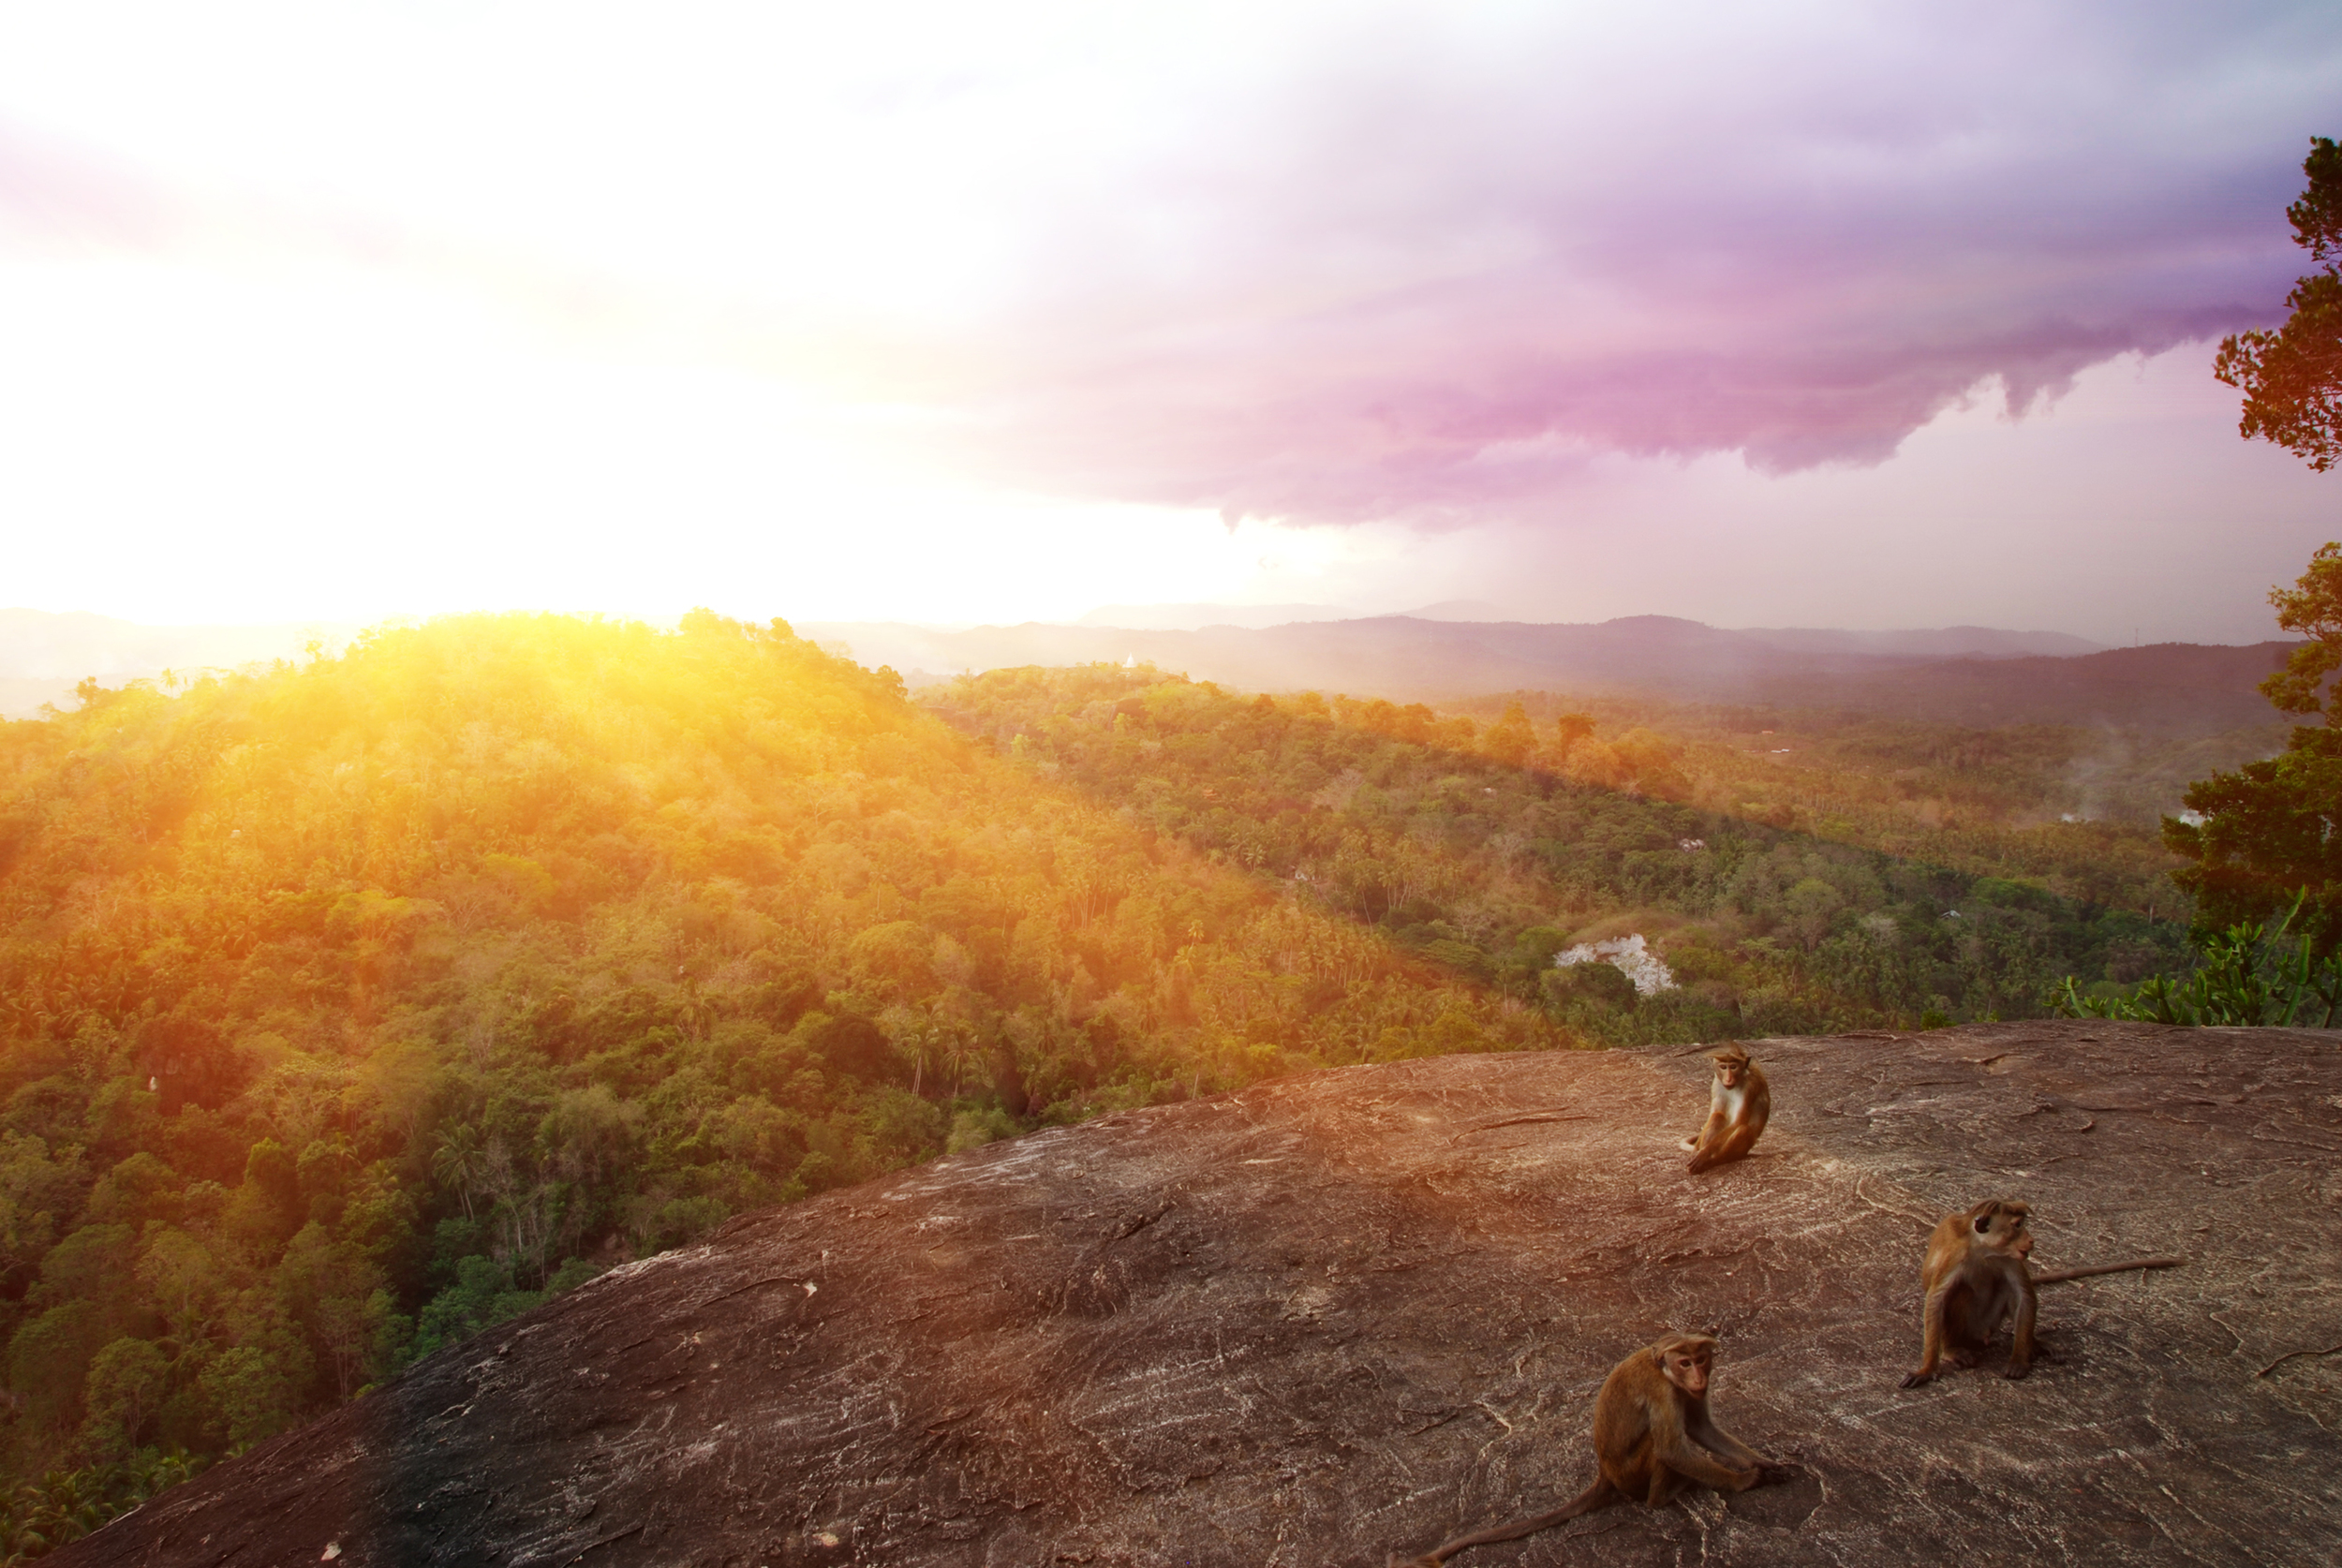 invite-to-paradise-sri-lanka-holiday-honeymoon-cultural-triangle-dambulla-cave-temple-view-monkeys.jpg